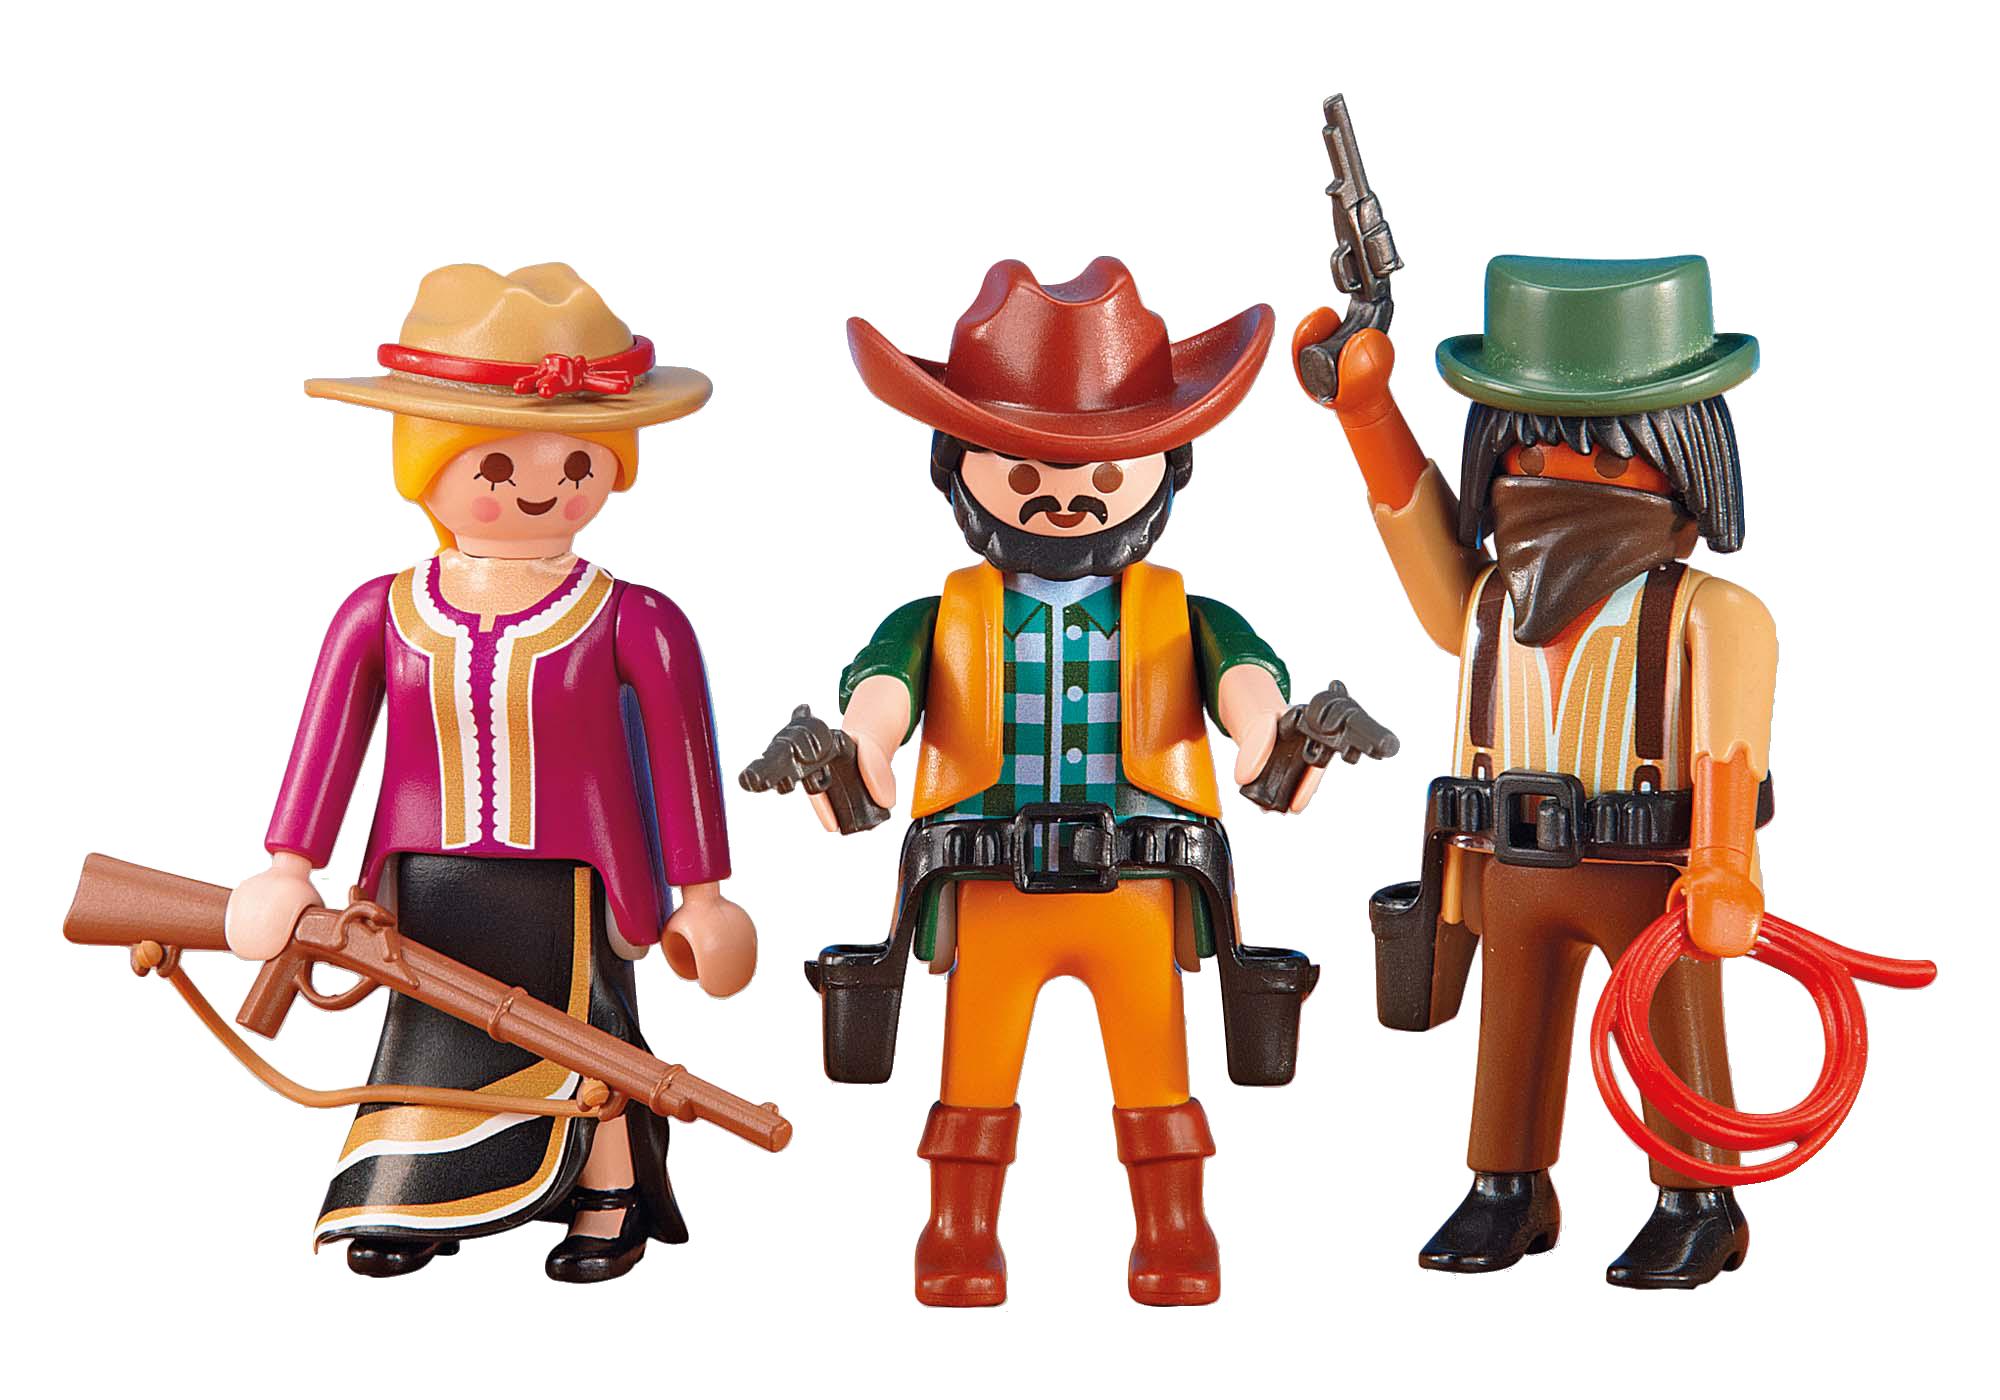 2 cowboys and cowgirl 6278 playmobil united kingdom